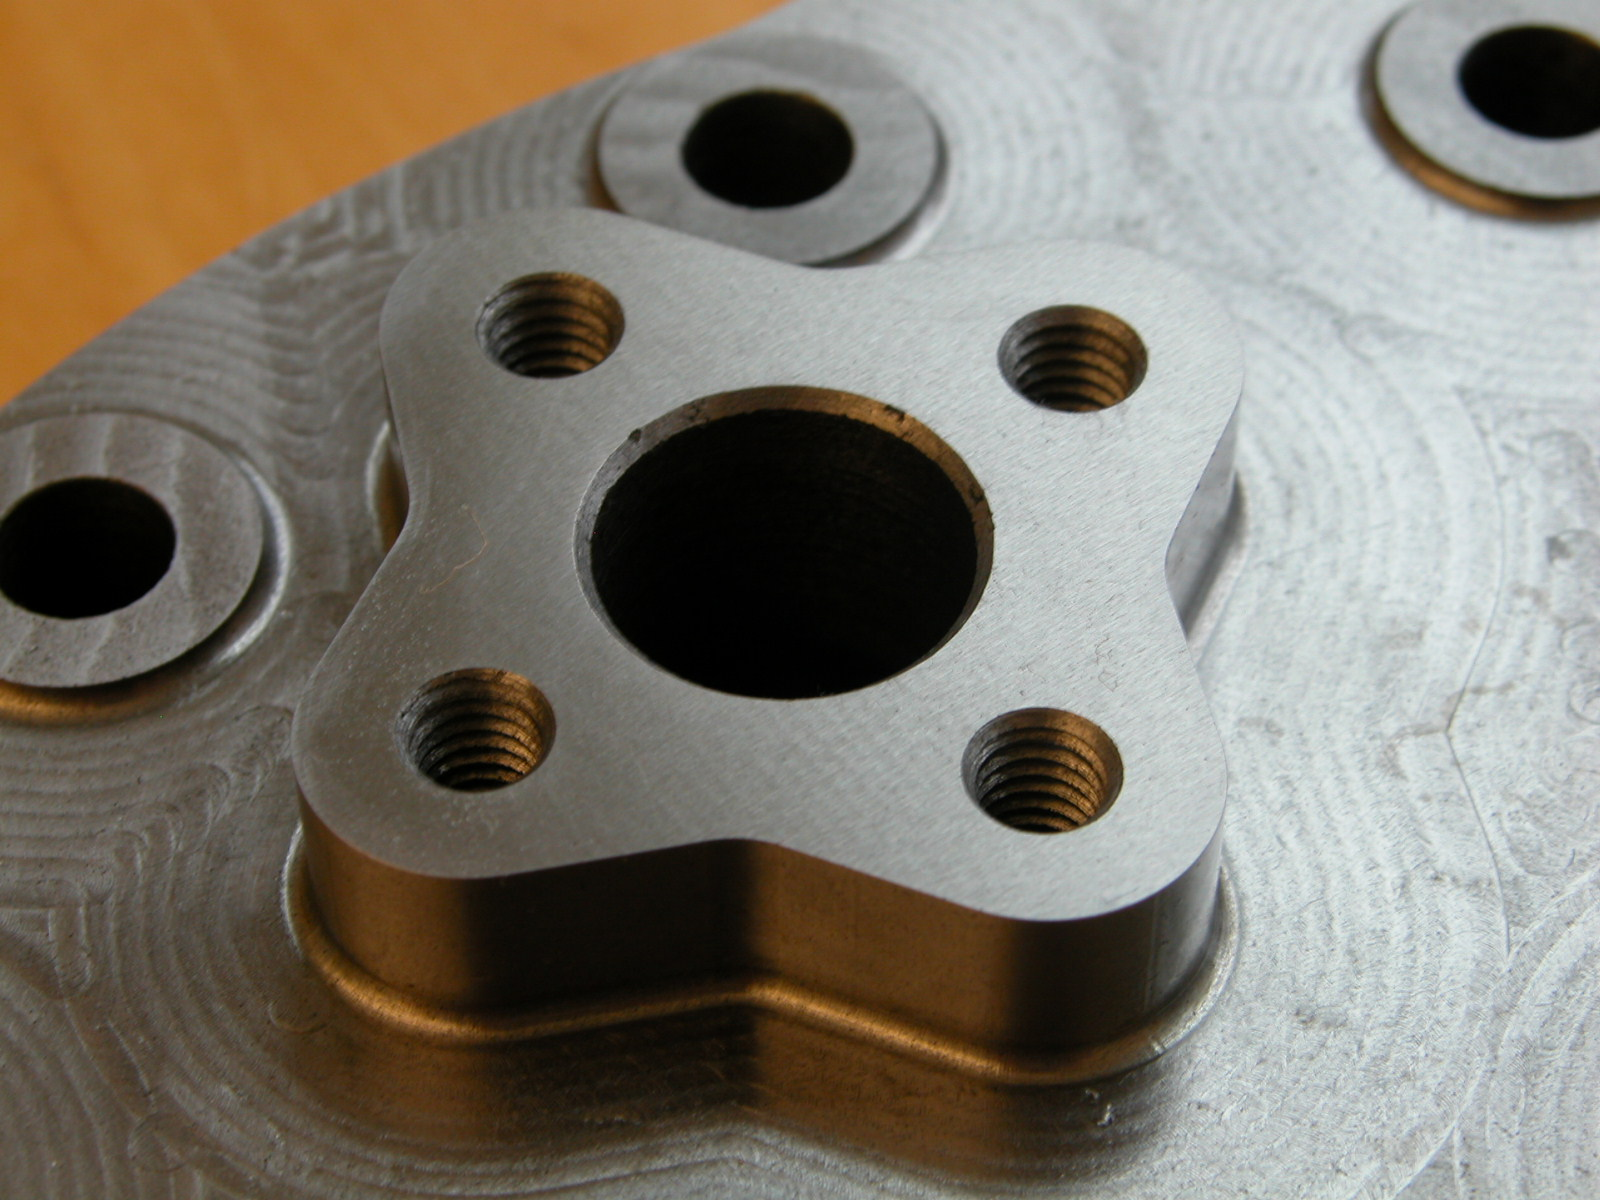 Retrofit Compressor Heads developed at the AMC - The